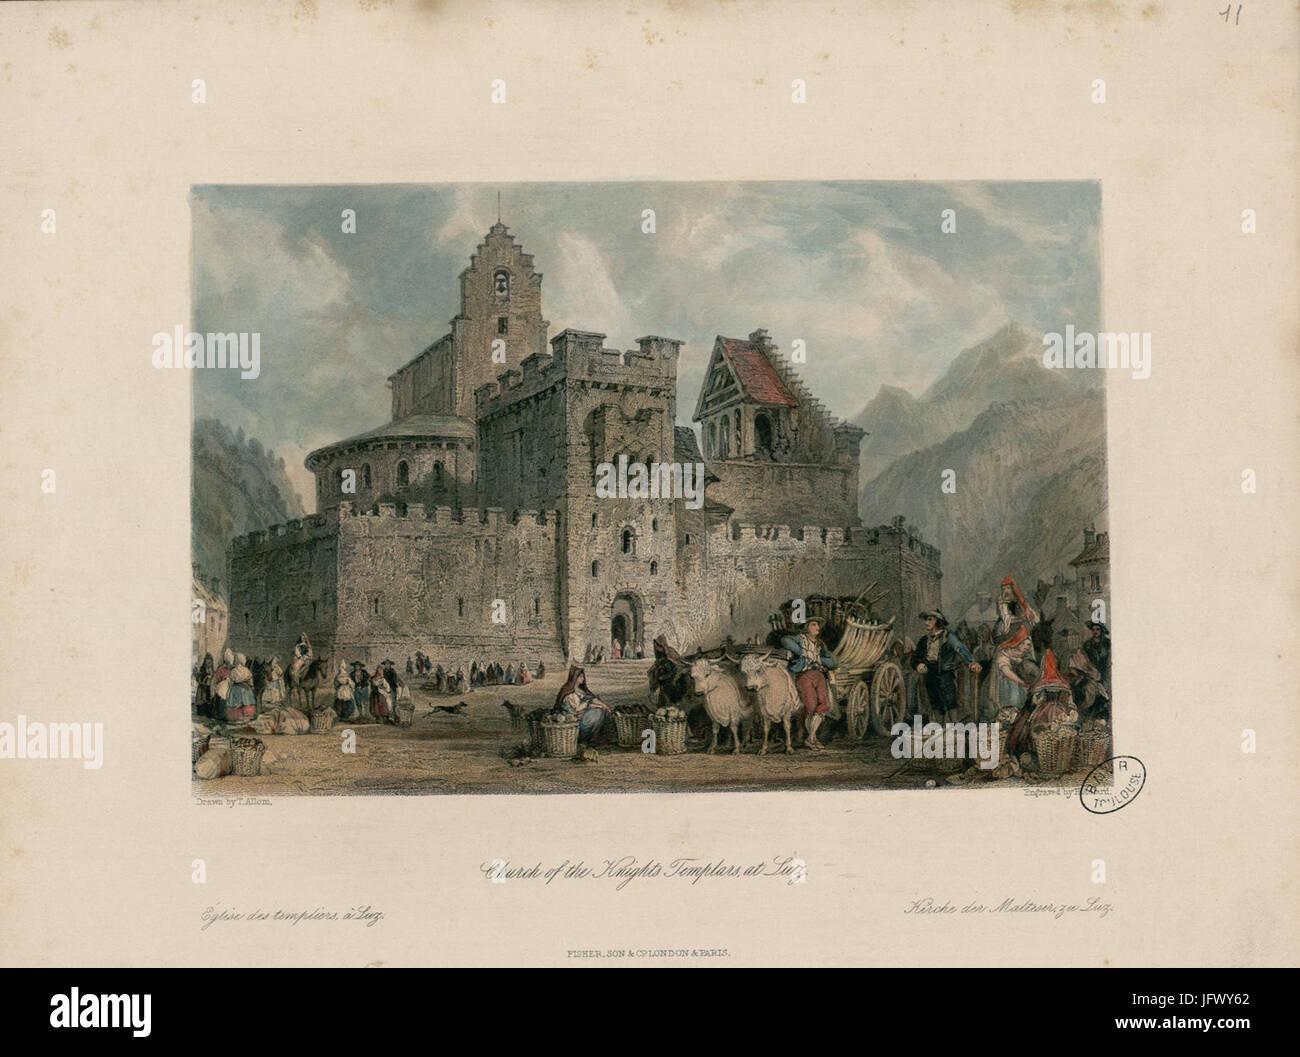 Church of the Knights Templars, at Luz = Eglise des Templiers, à Luz = Kirche der Malteser, zu Luz - Fonds - Stock Image